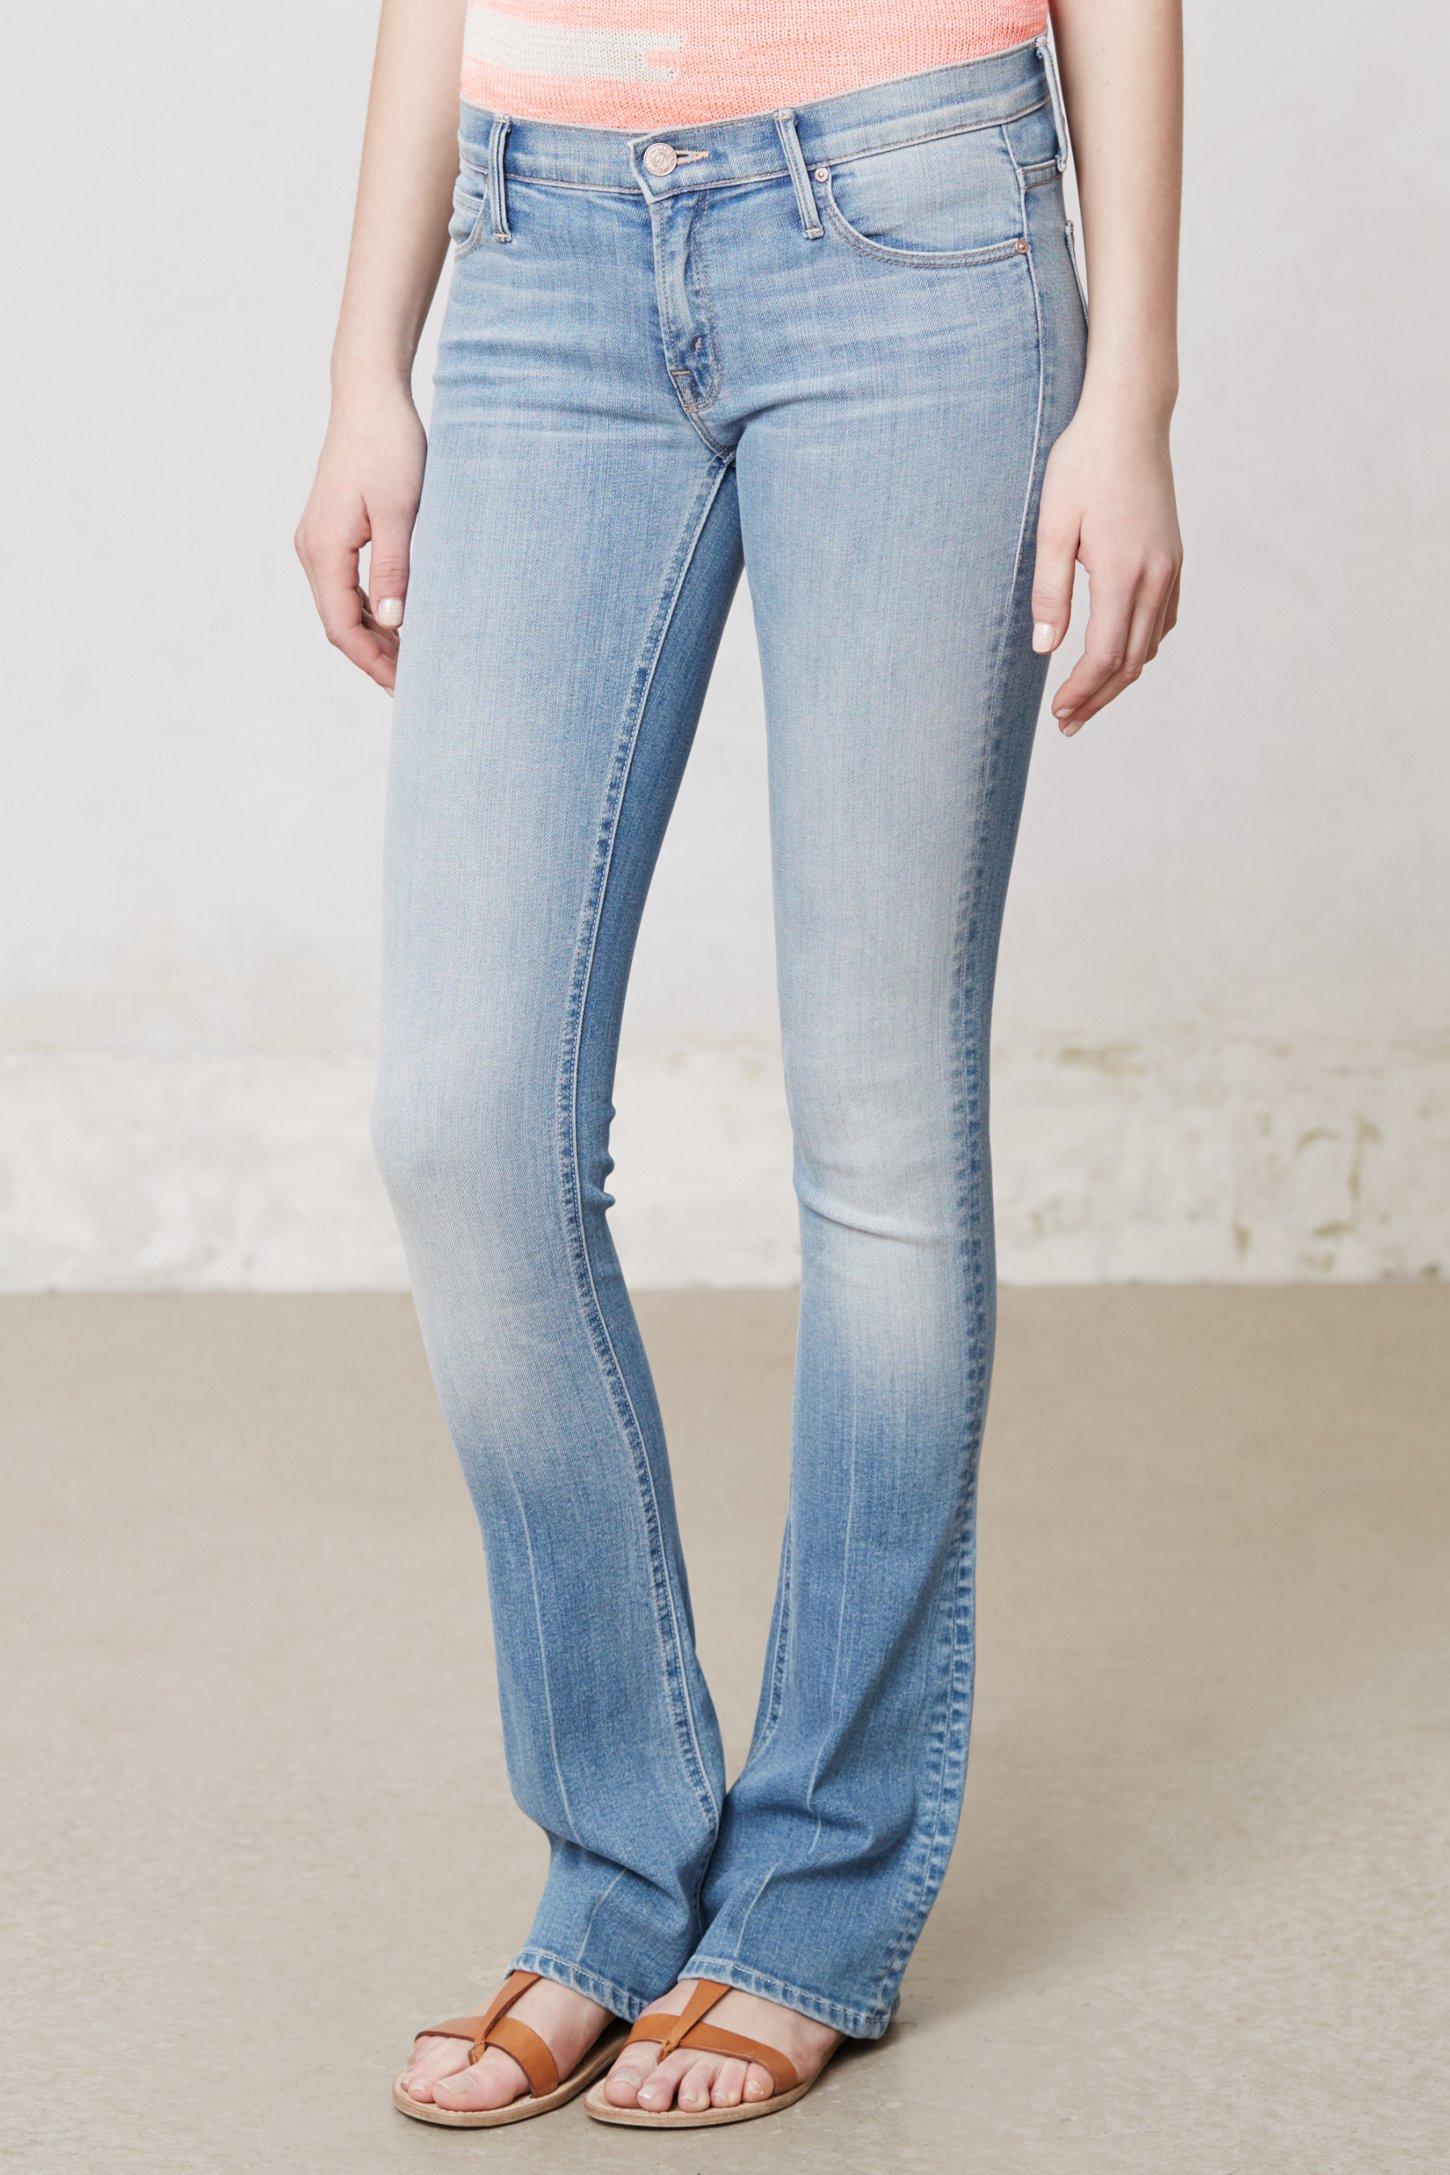 Runaway skinny flare jeans